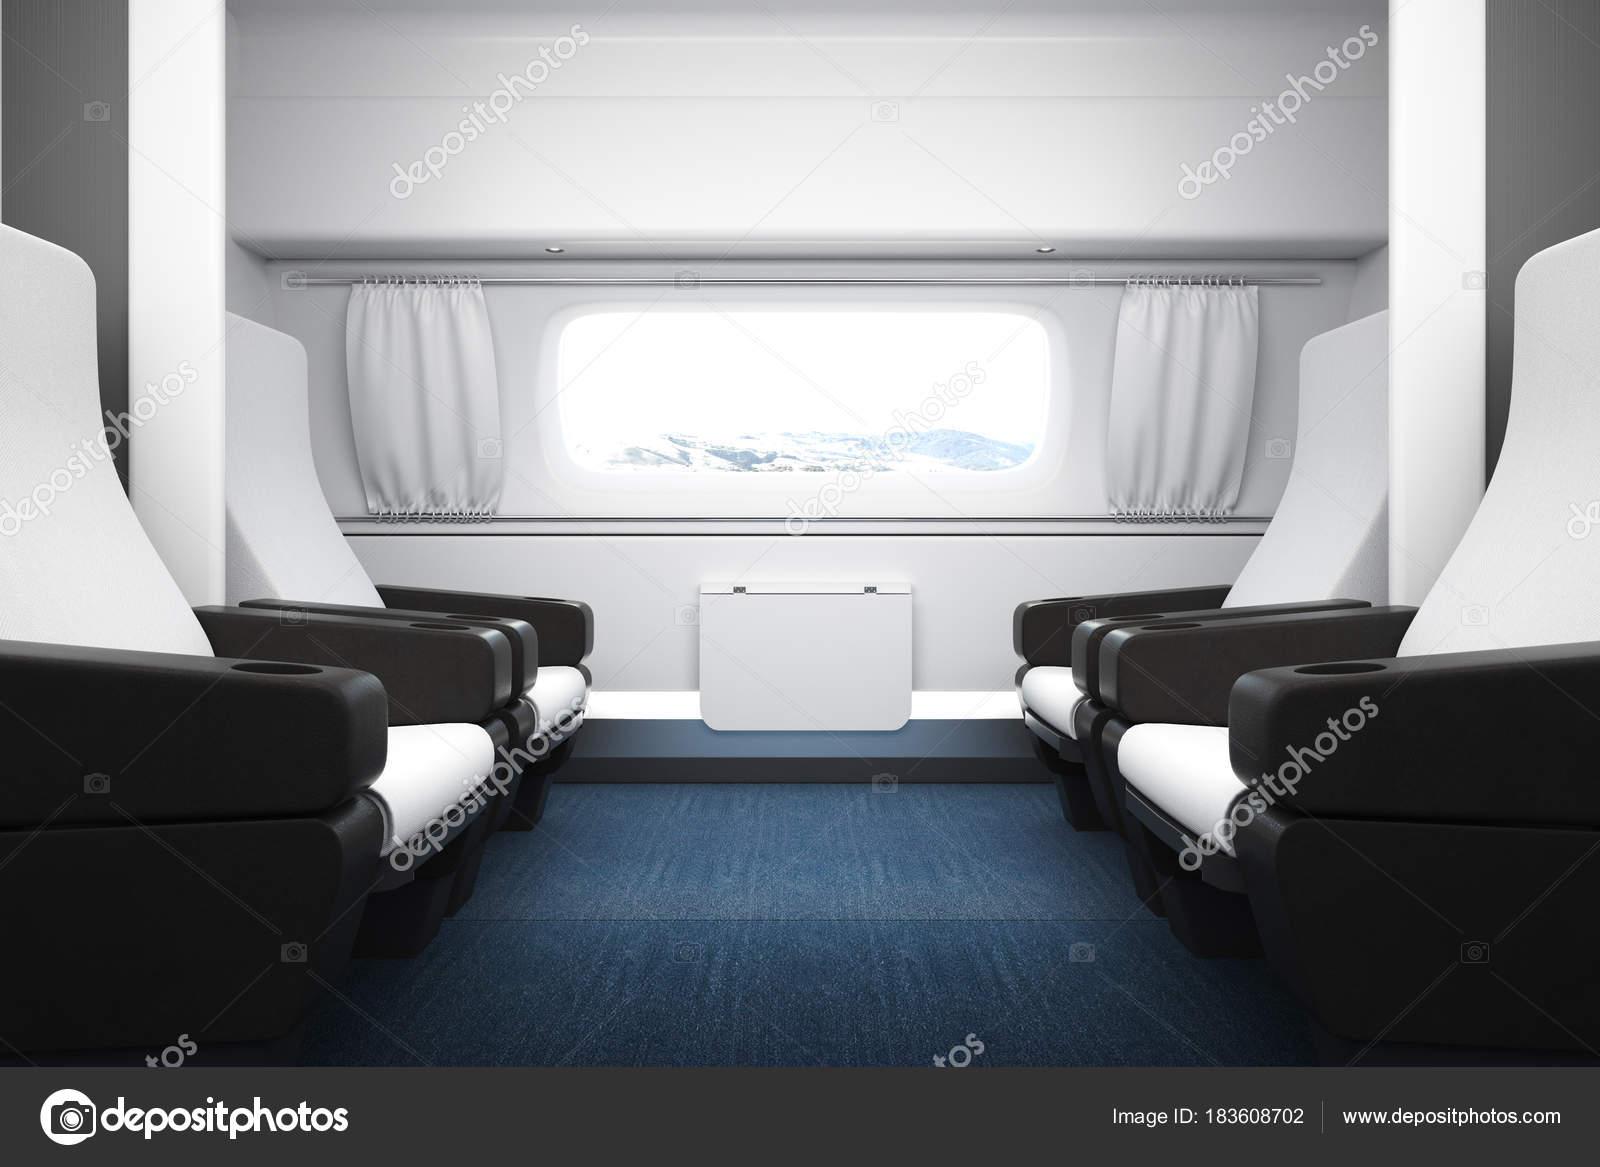 7f758d0d4e12f4 Hellen Luxus Zug Innenraum — Stockfoto © peshkova #183608702